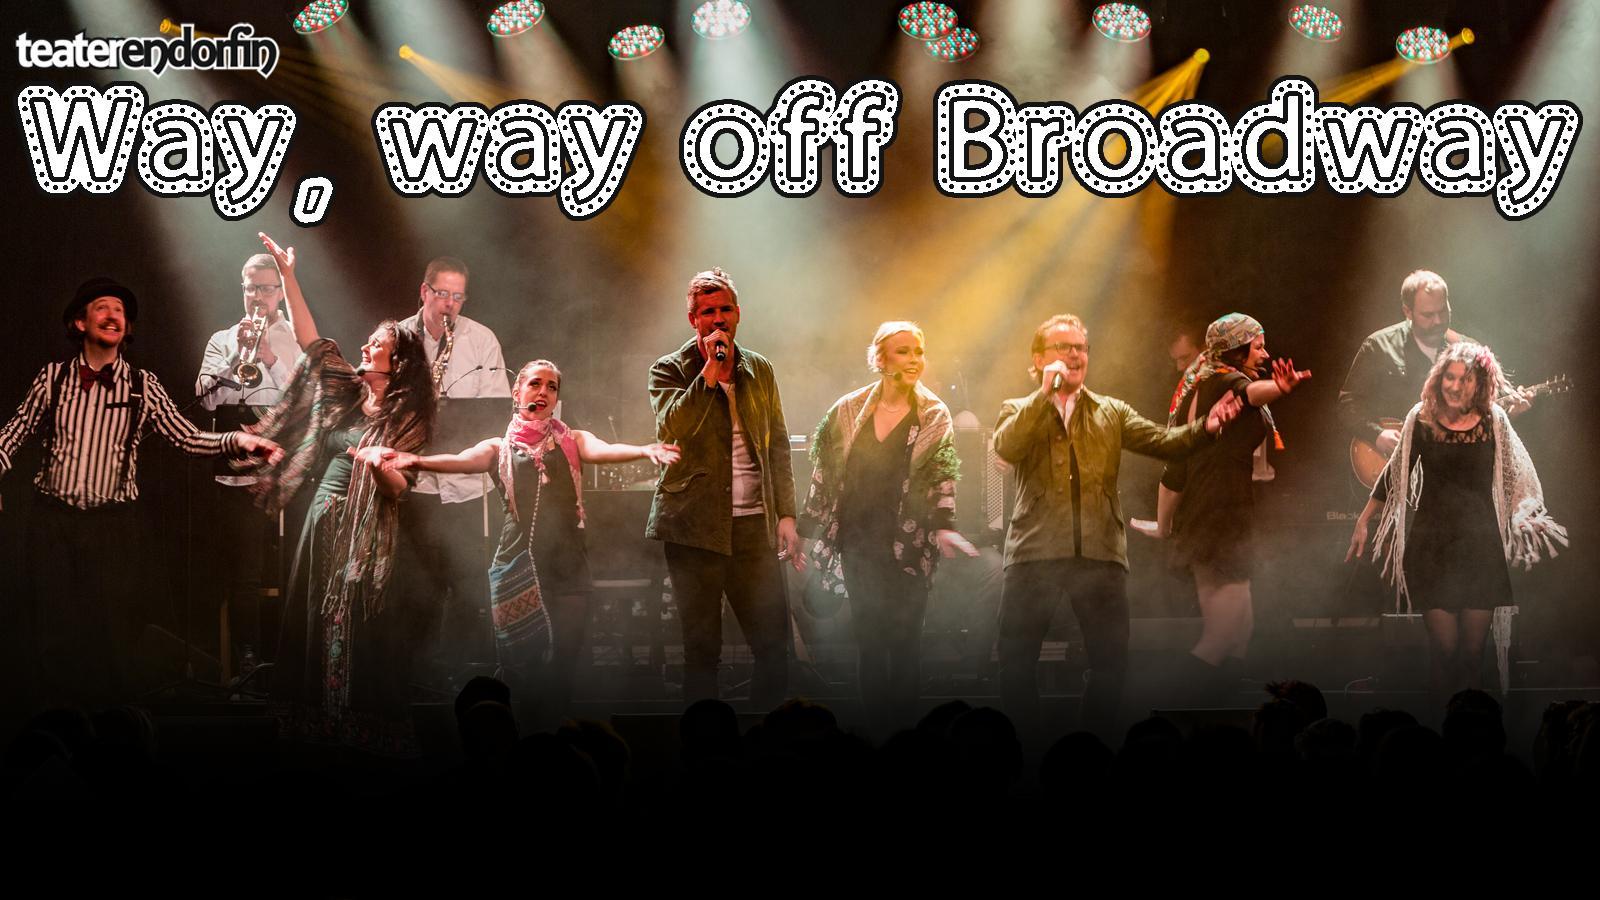 Way, way off Broadway 2